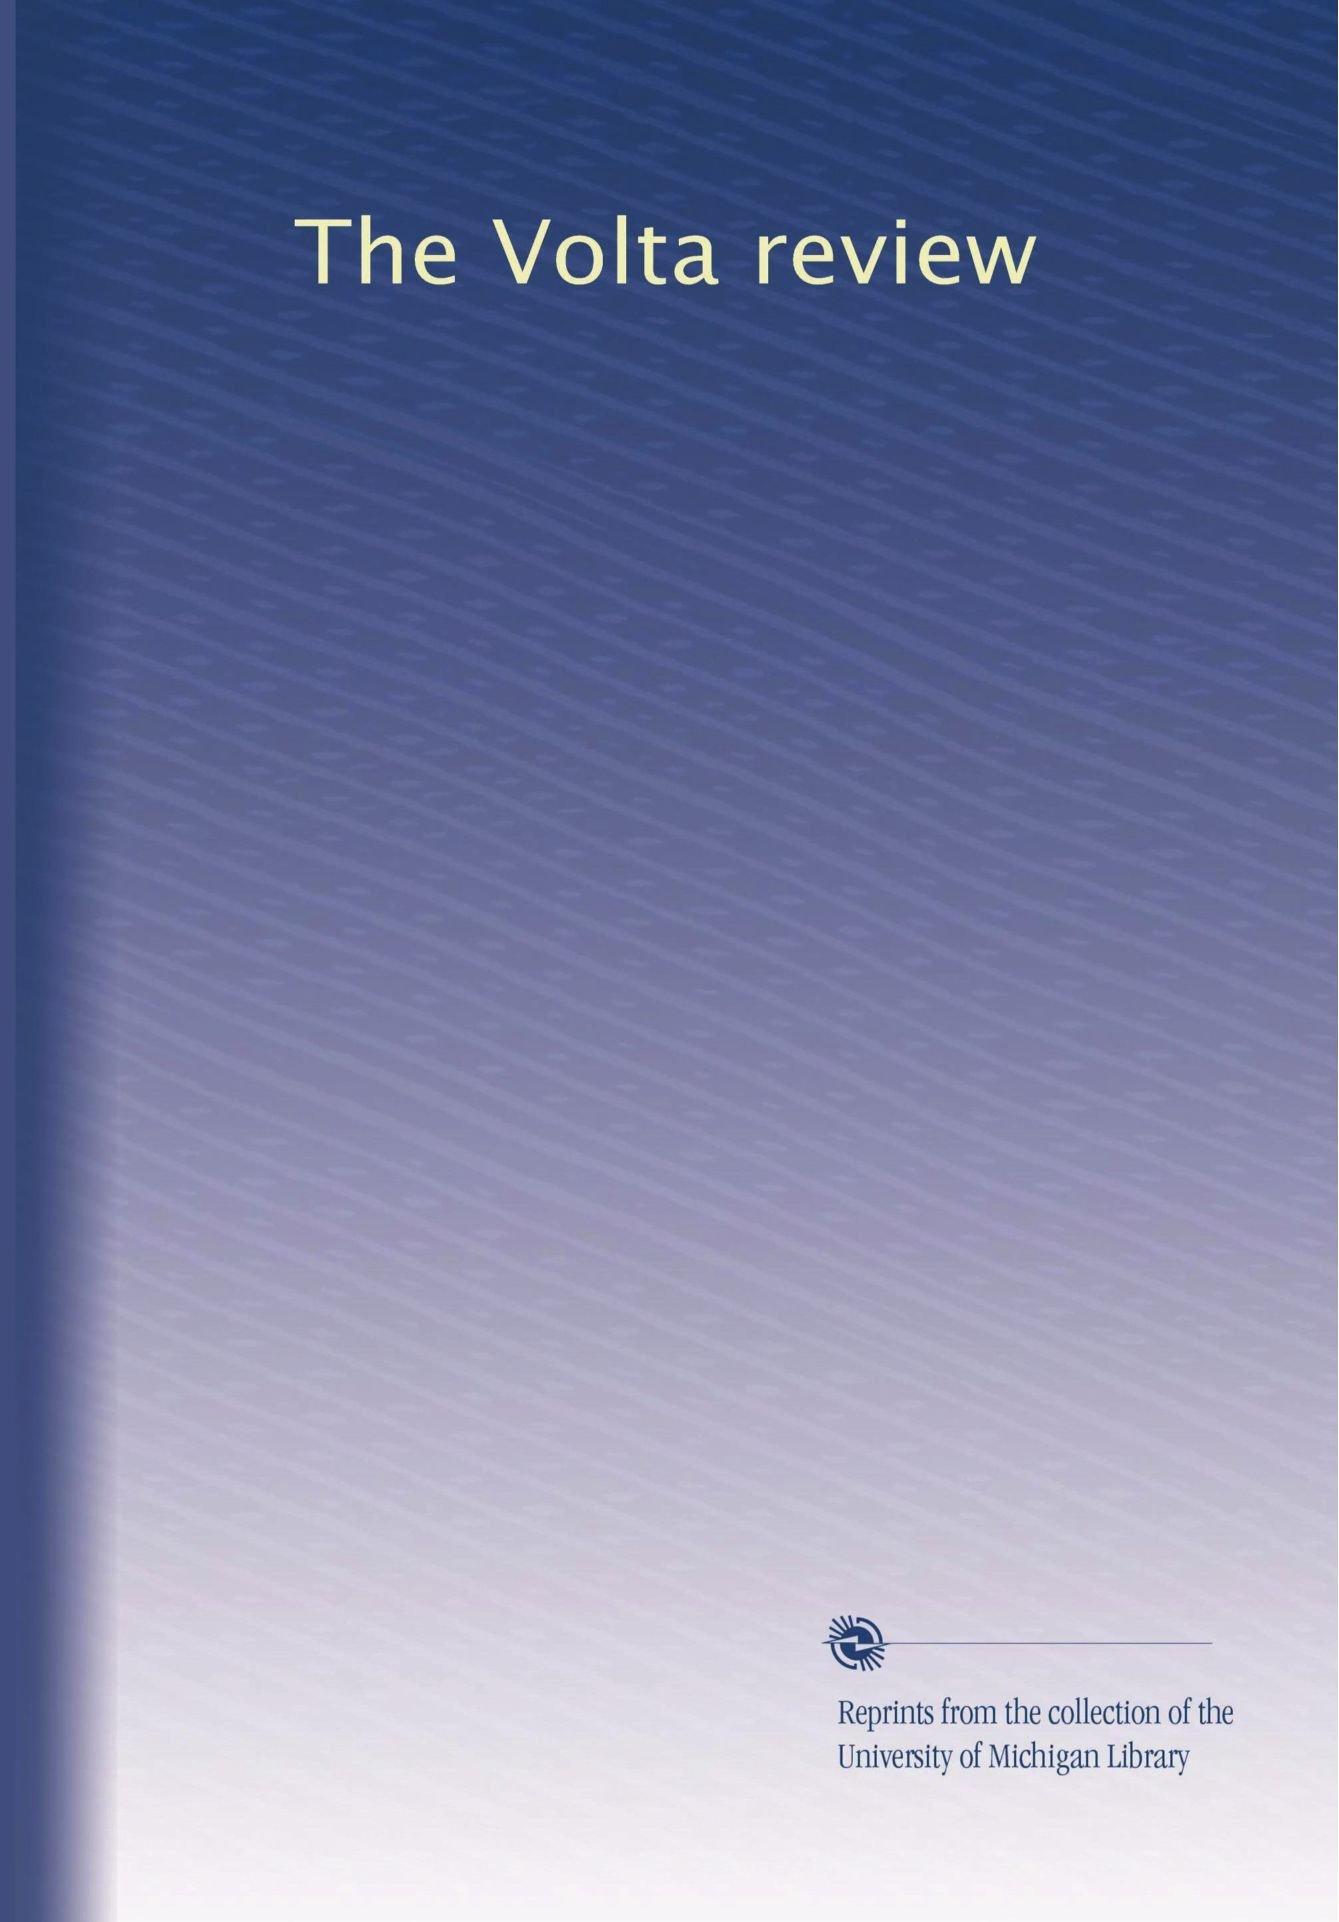 The Volta review (Volume 7) pdf